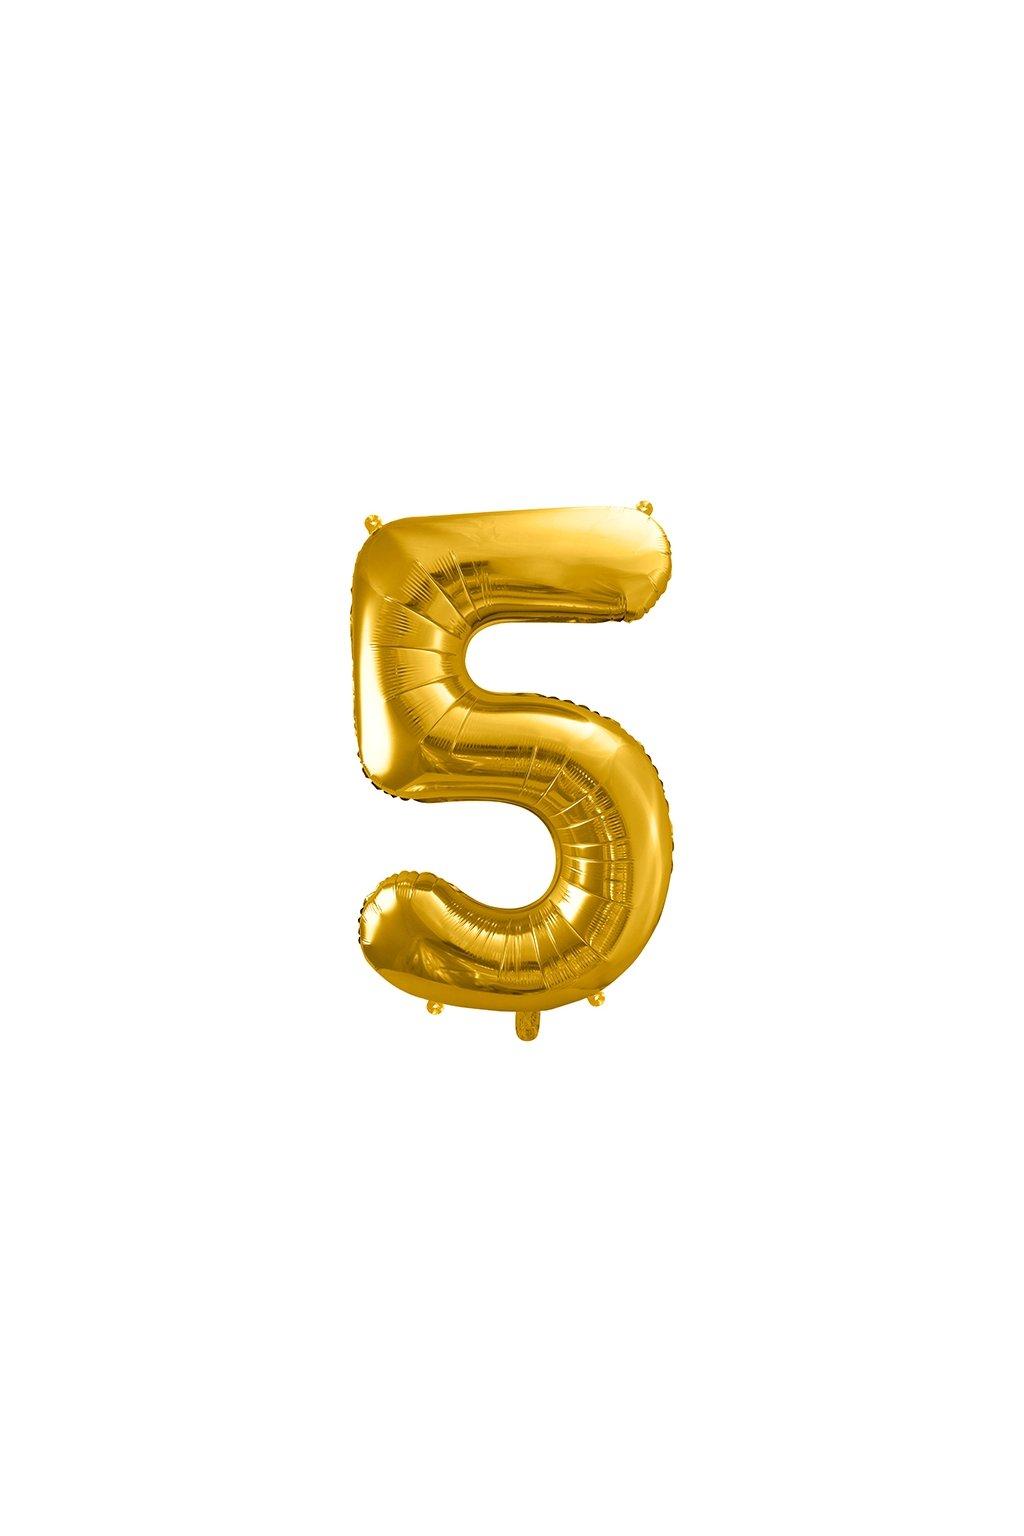 Fóliový balónek číslo 5 - zlatý 86cm